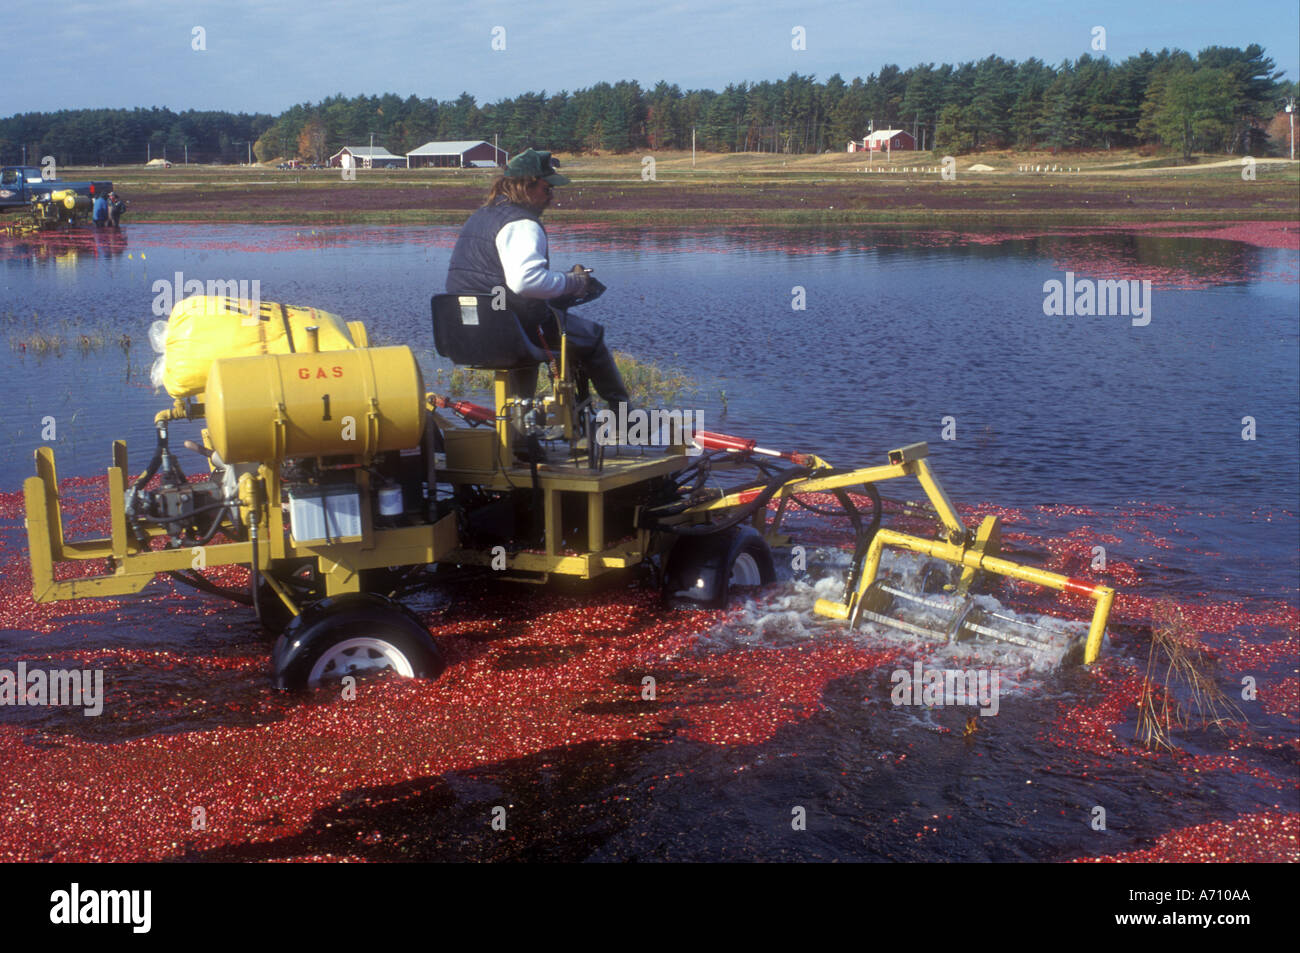 AJ0068, MA, South Carver, Massachusetts Stock Photo ...